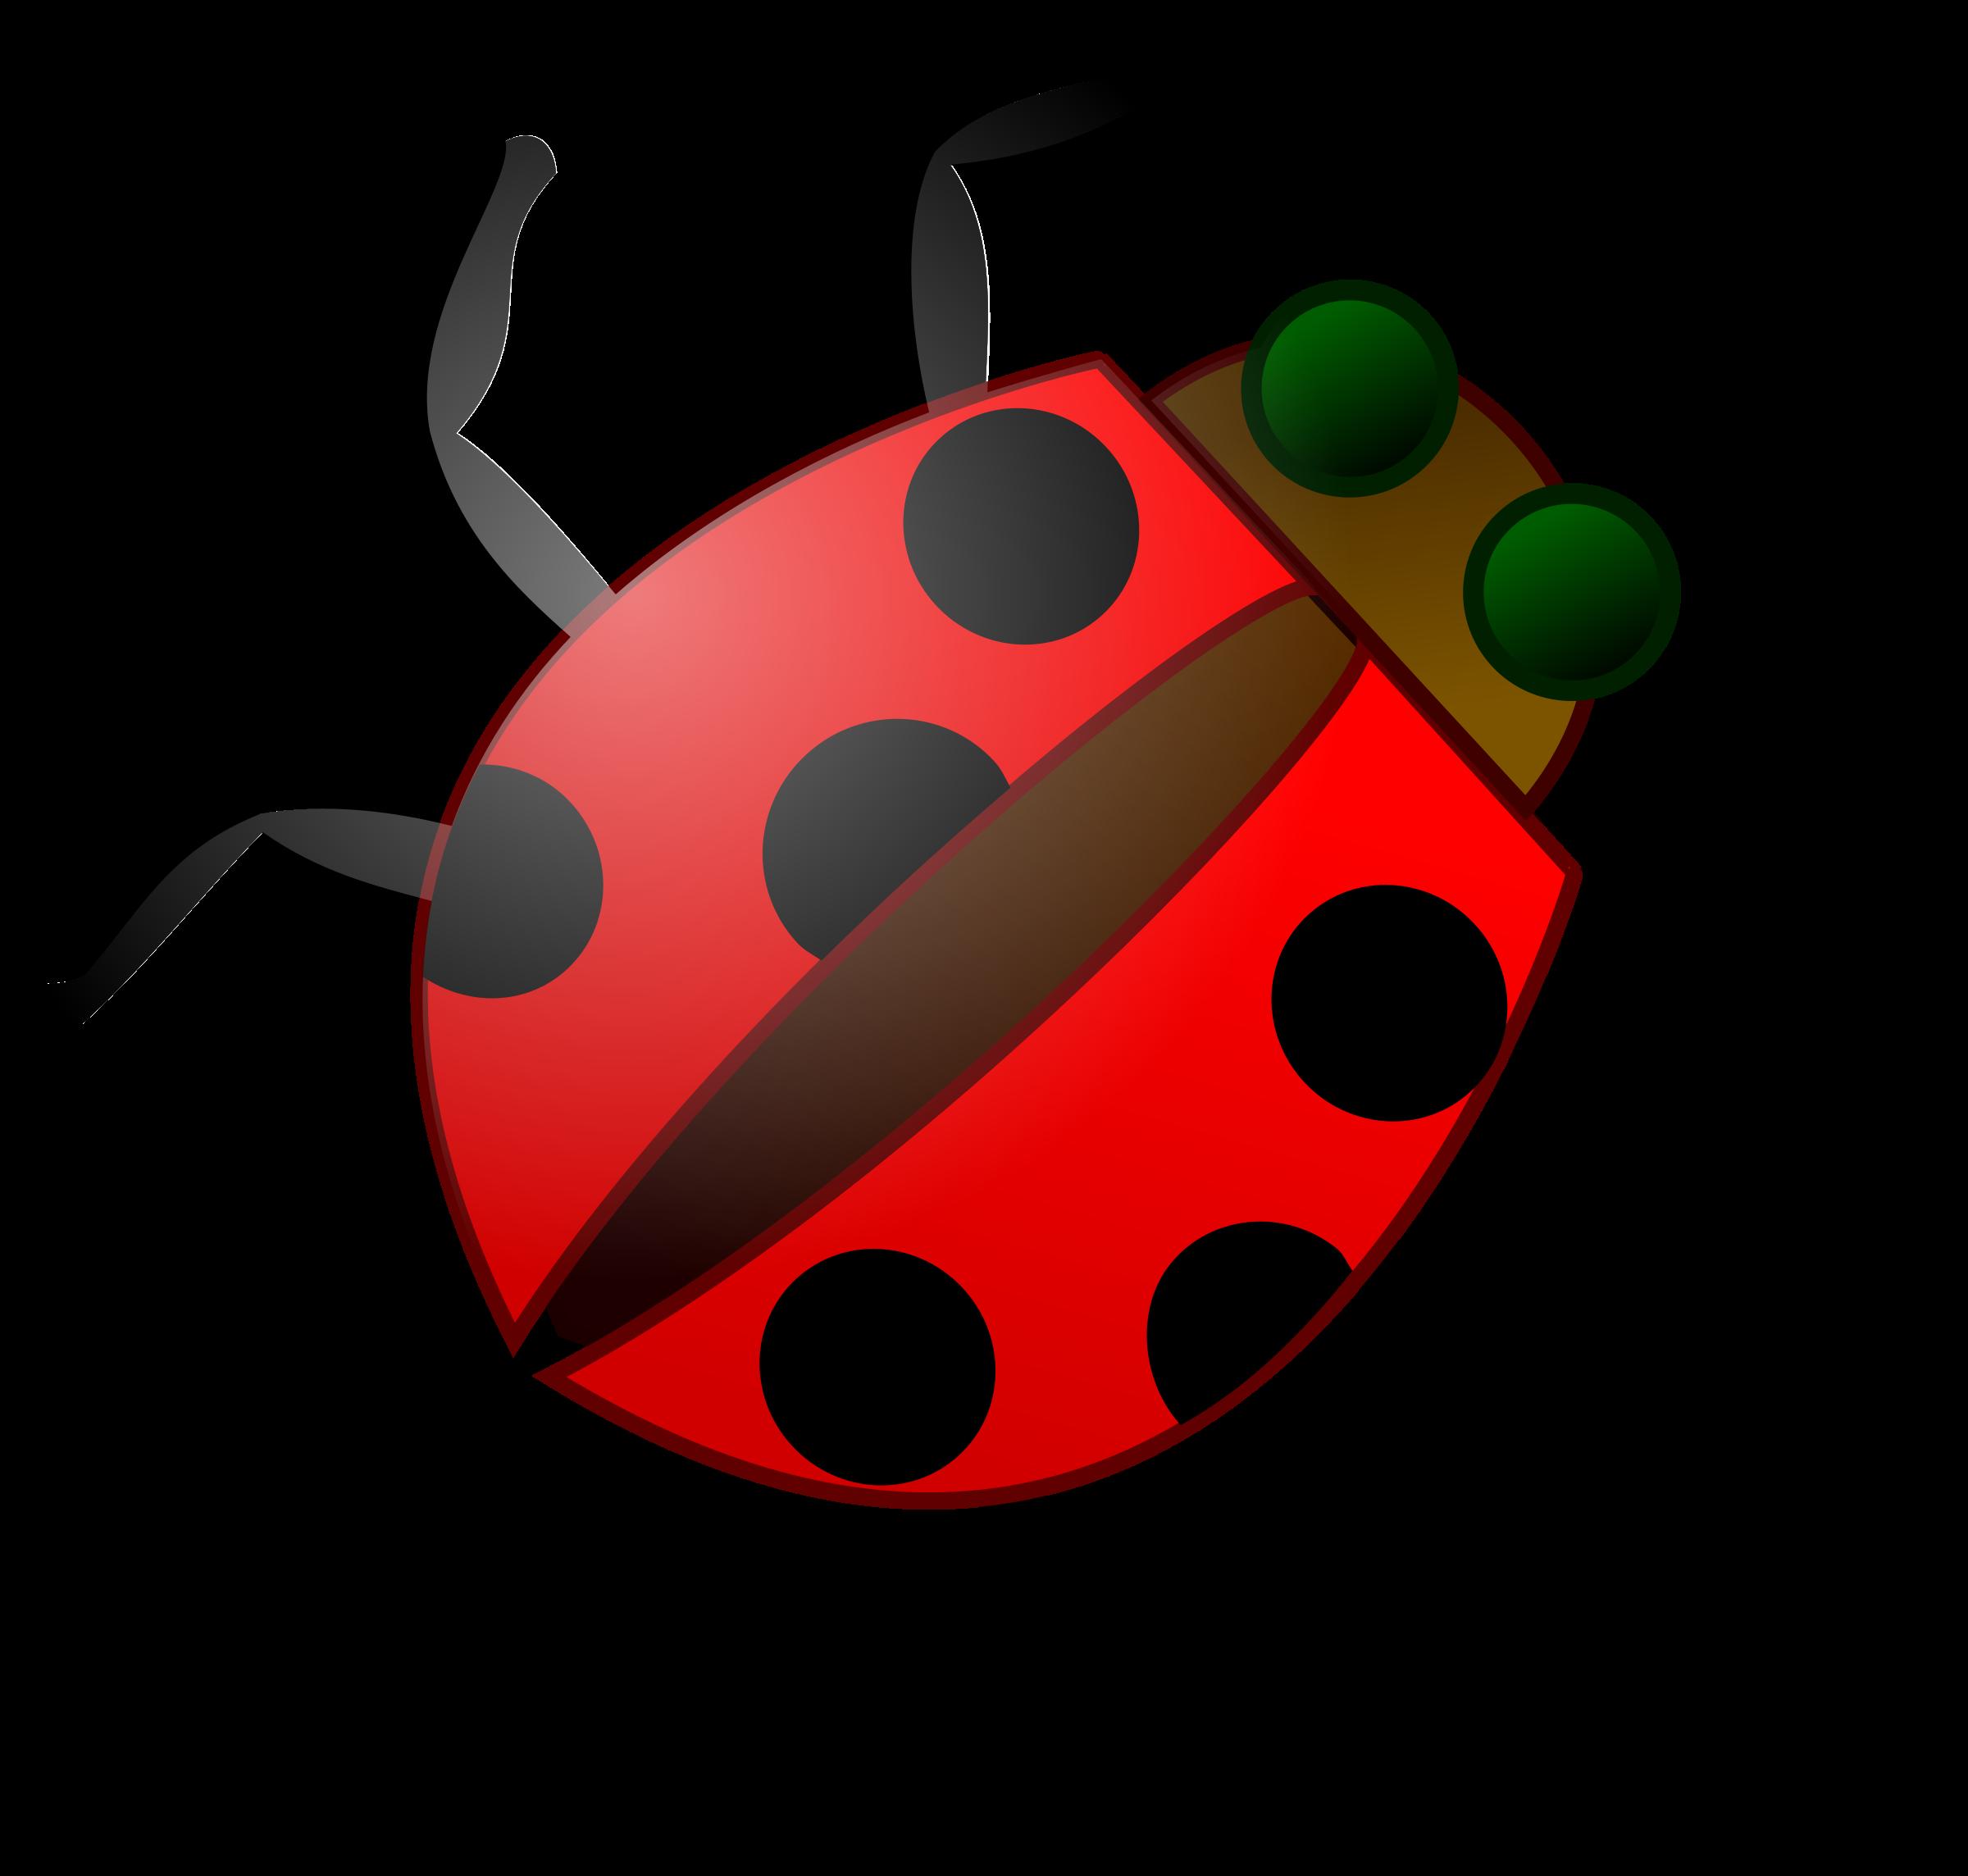 Ladybug clipart love. Big image png